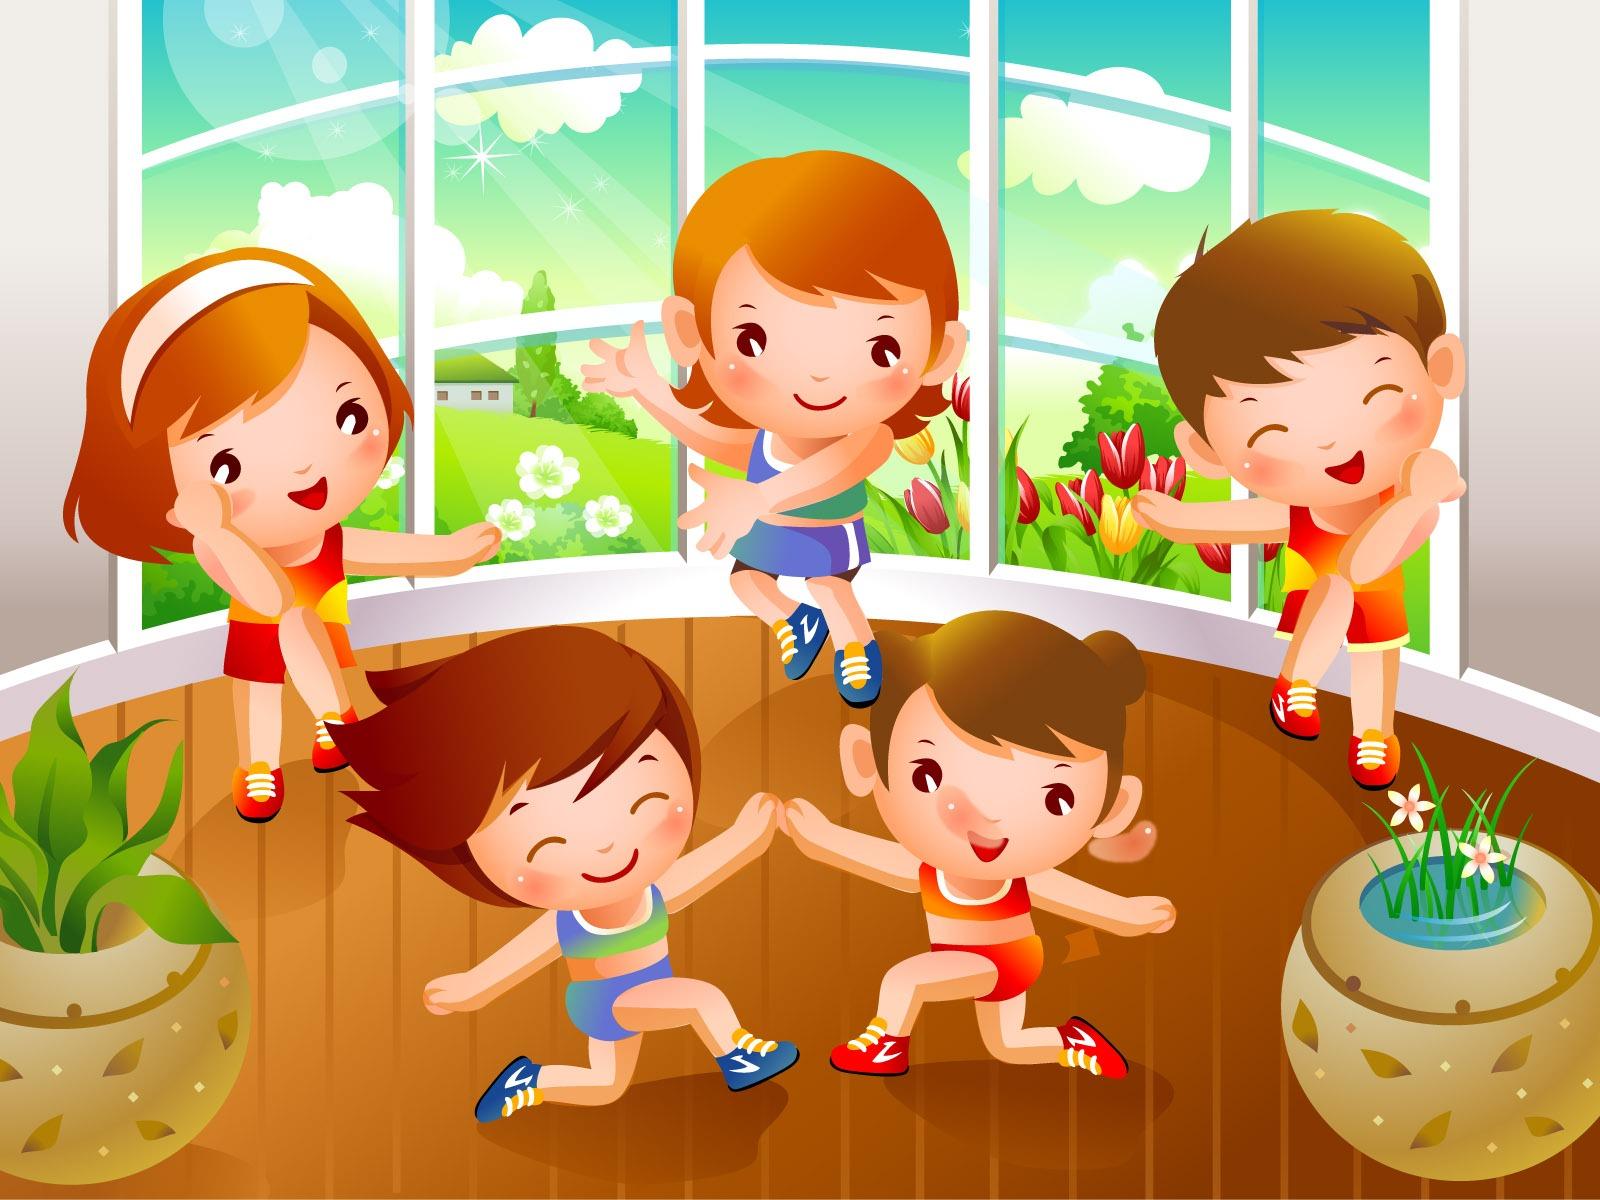 Картинки дети и спорт в детском саду